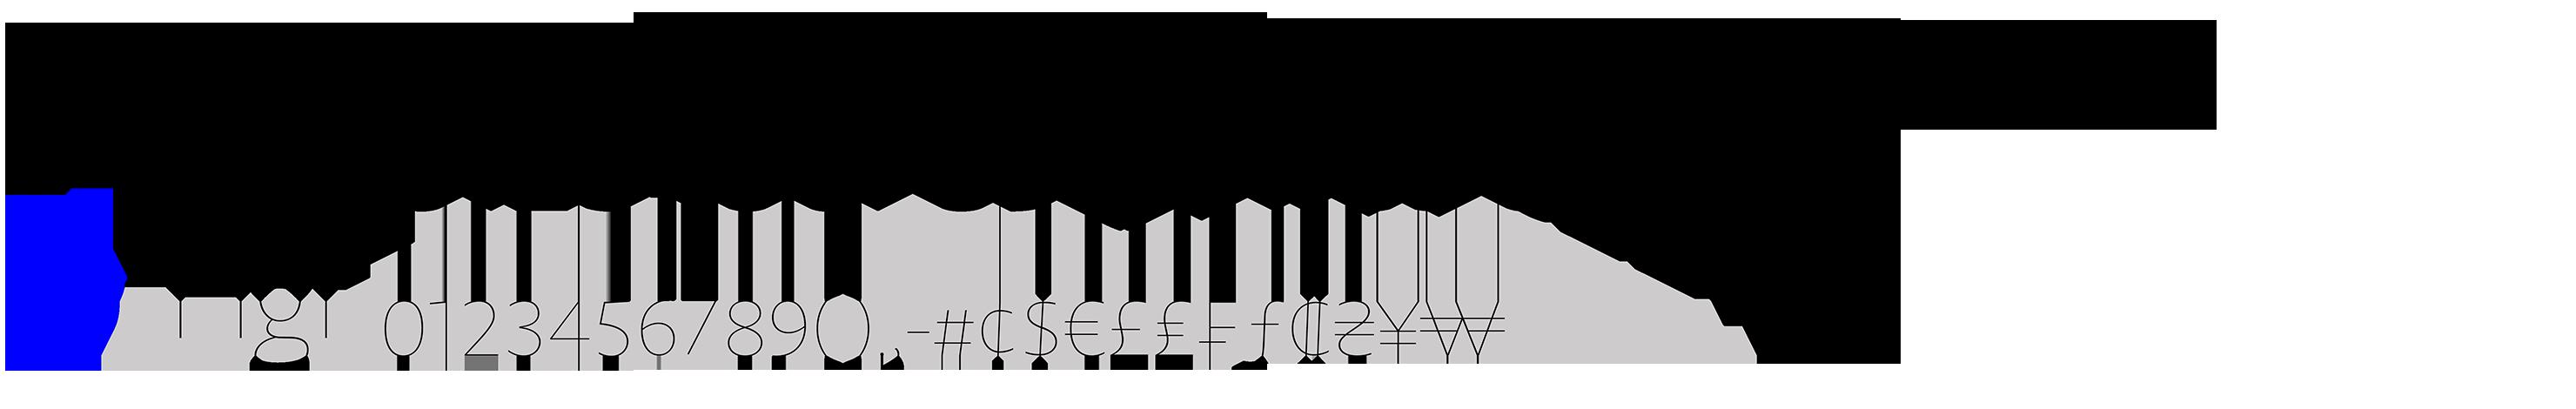 Typeface-Novel-Sans-Hairline-F17-Atlas-Font-Foundry